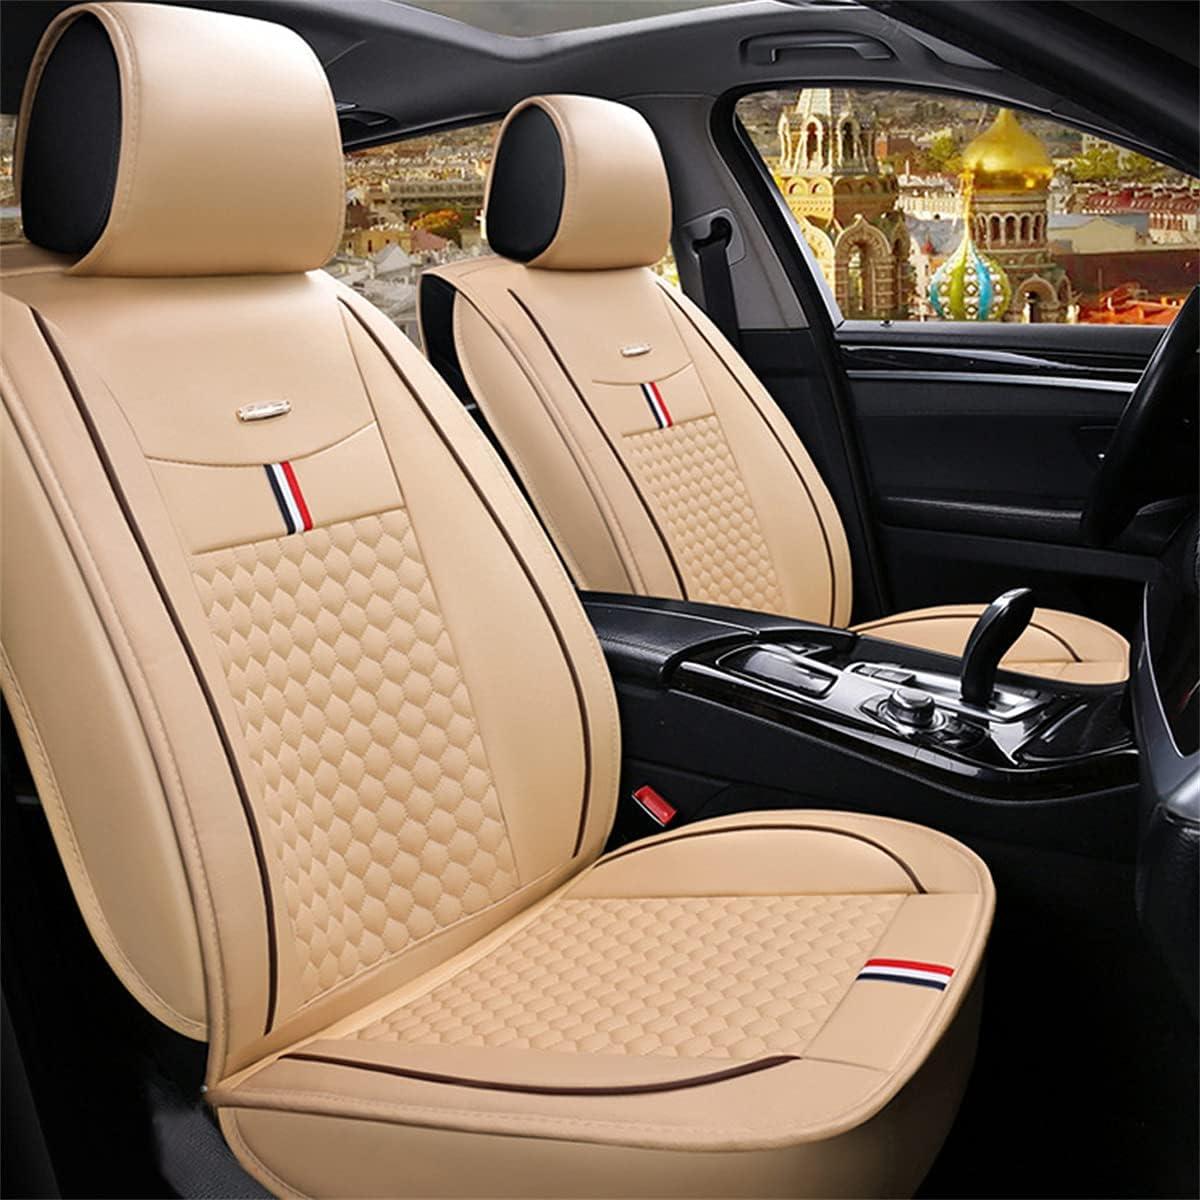 Car Seat Covers fit for S Max 56% OFF Crosstrek Outdoor Sport ubaru New arrival 2020-202